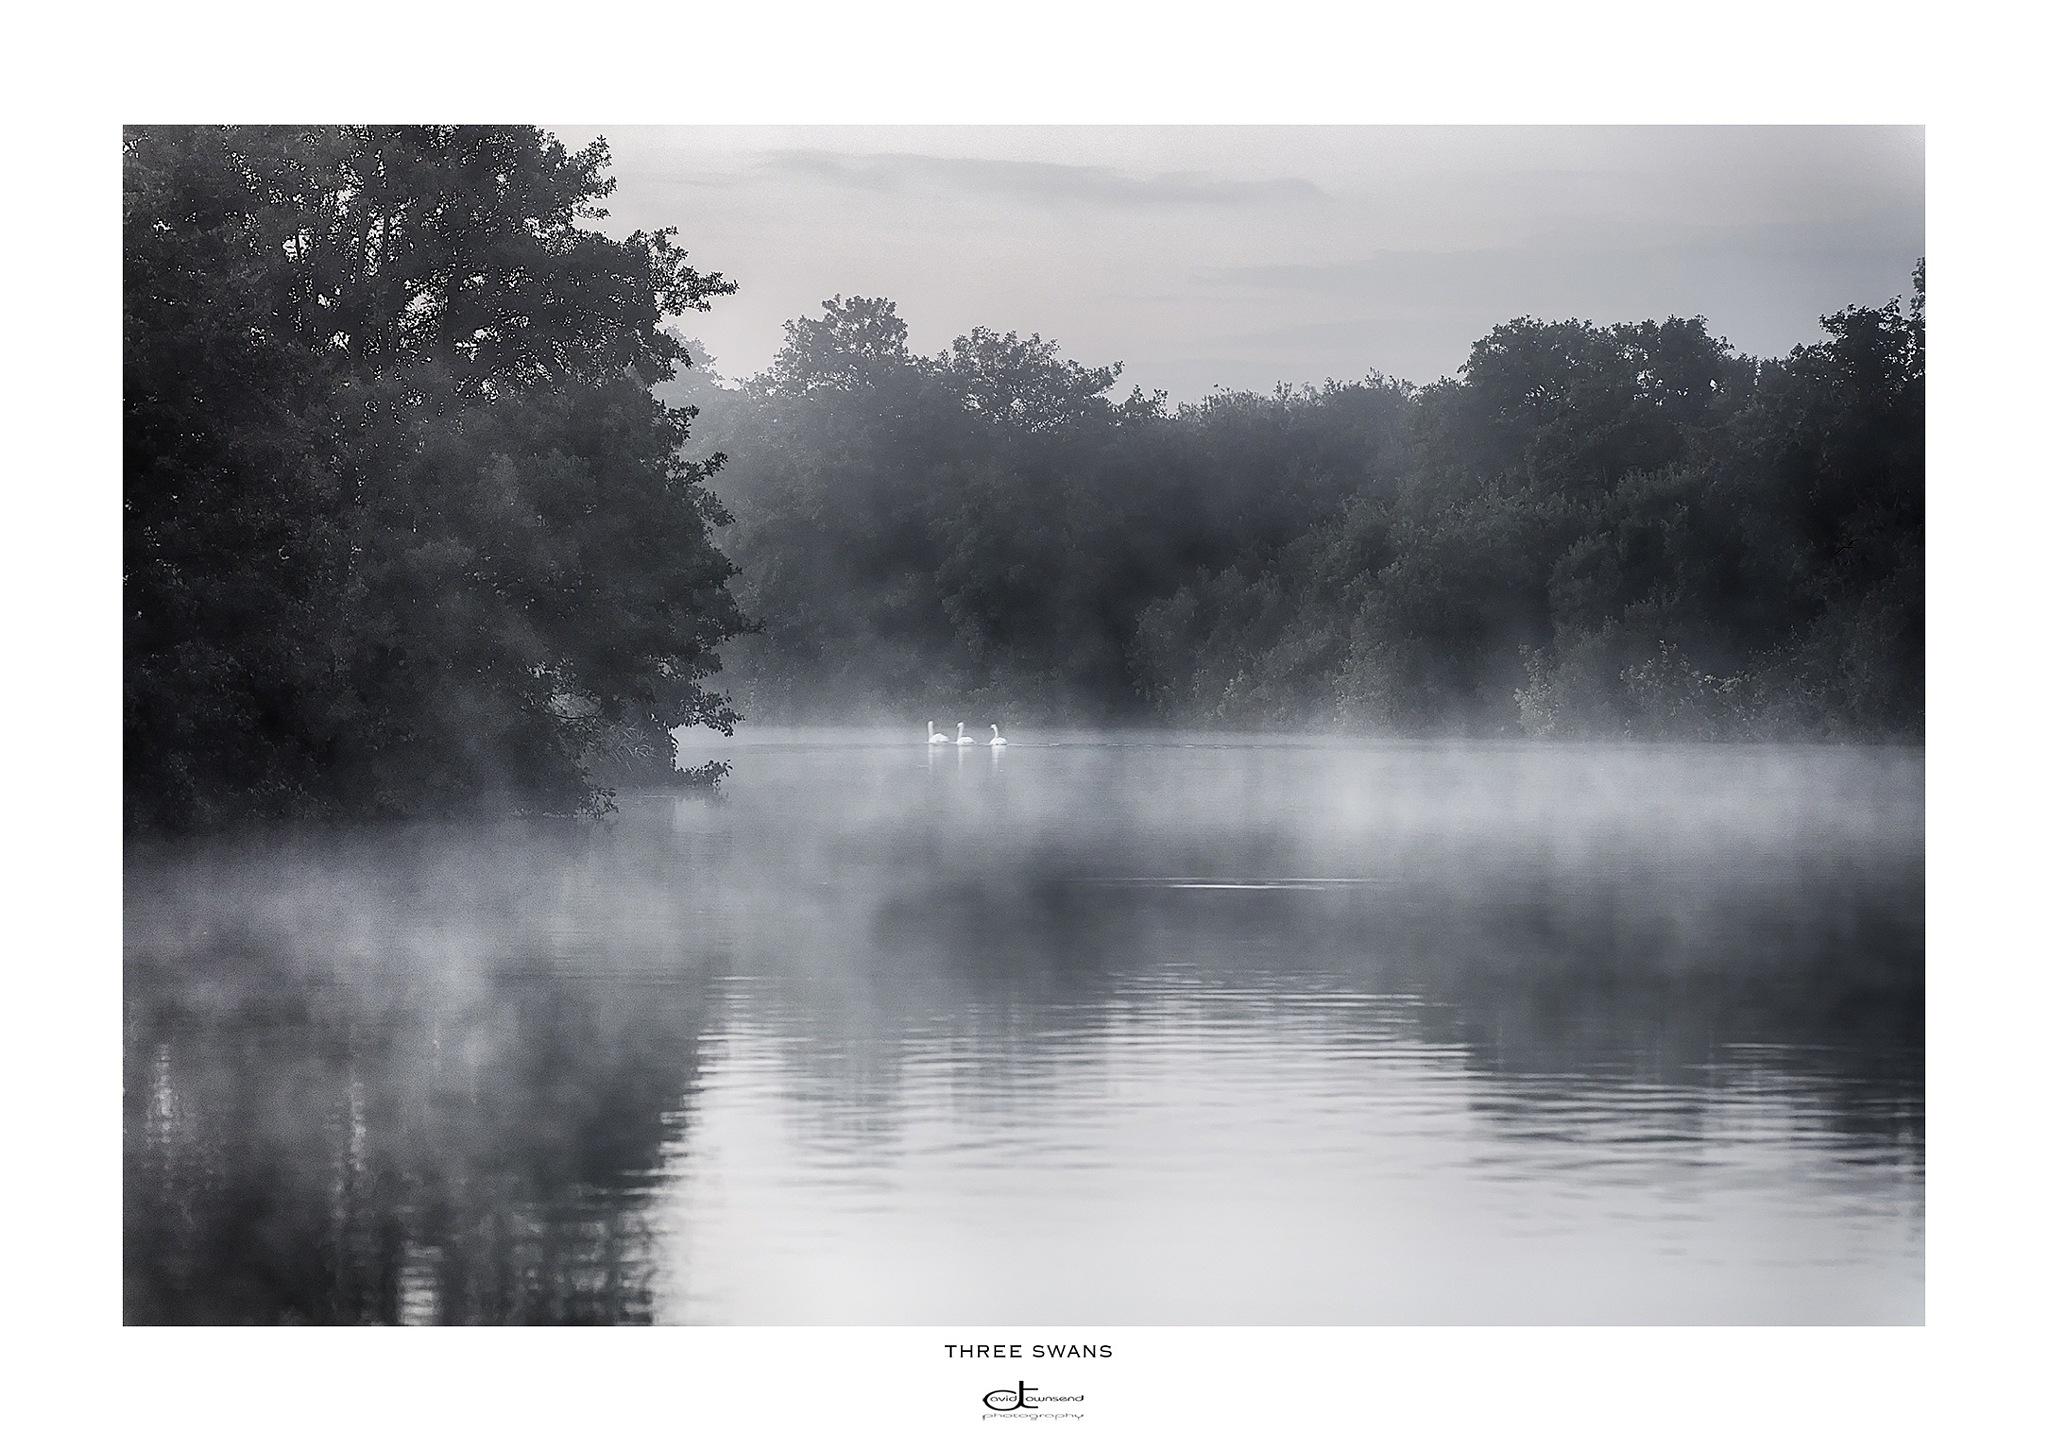 Three swans by David Townsend